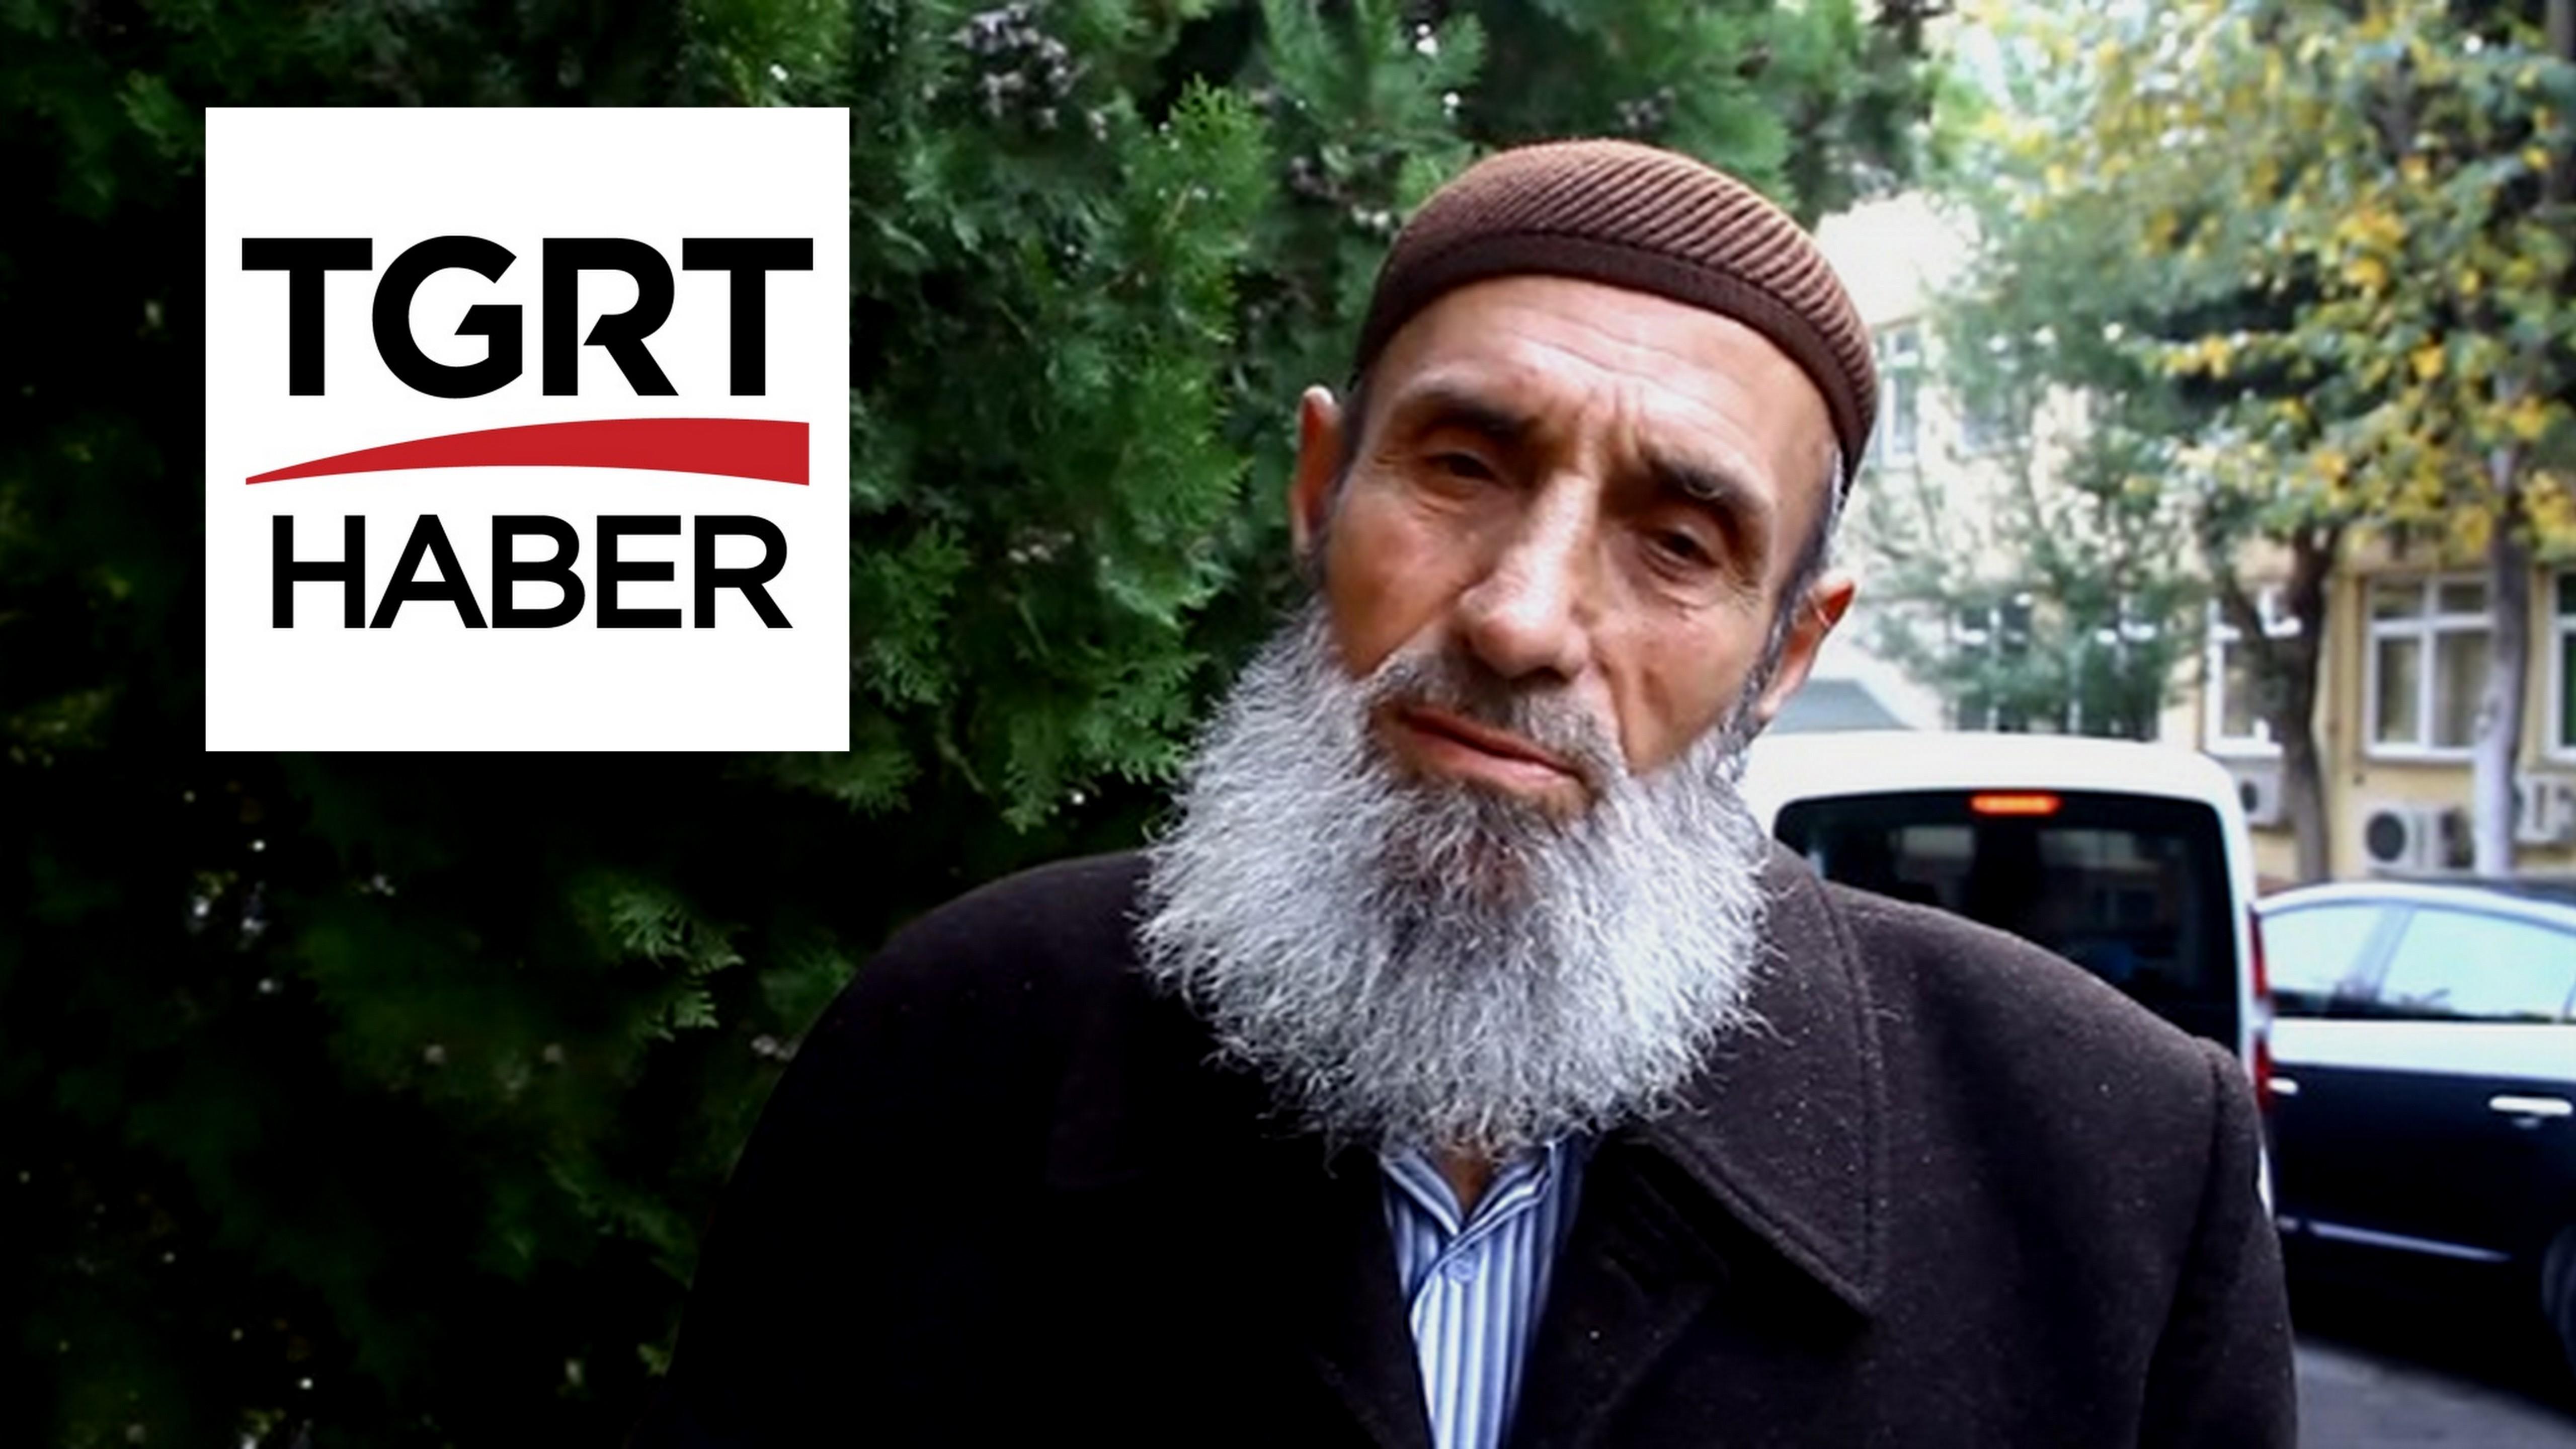 HOCA ASIM SAFİTÜRK TGRT HABER ANA HABER  MANŞETTE